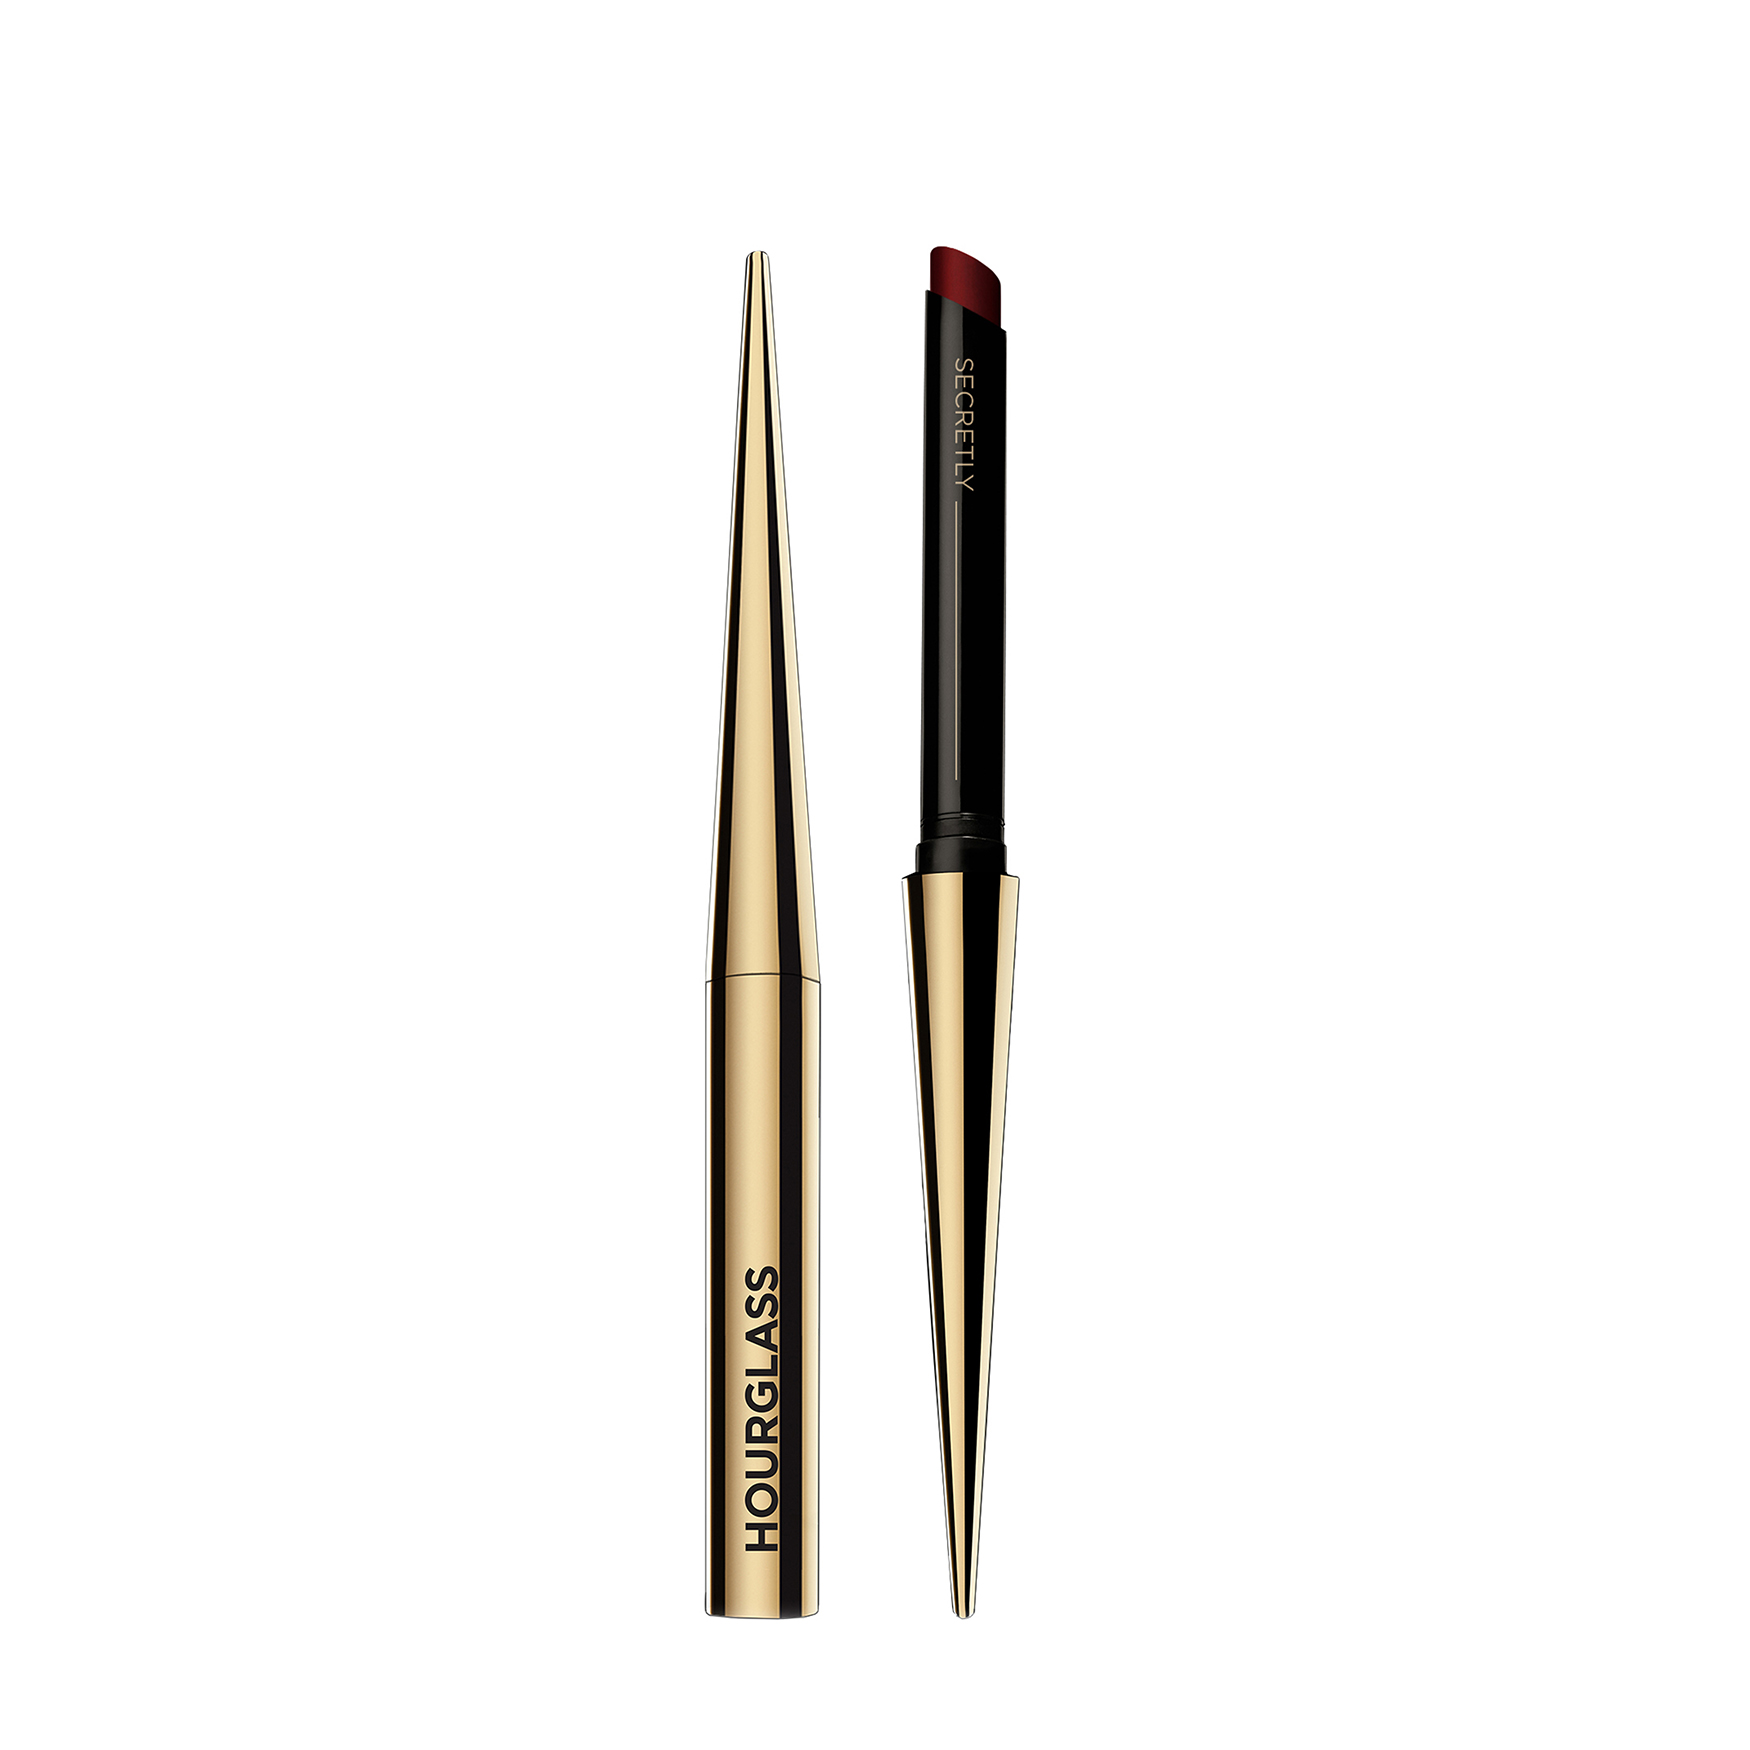 Confession Ultra Slim High Intensity Refillable Lipstick, SECRETLY, large